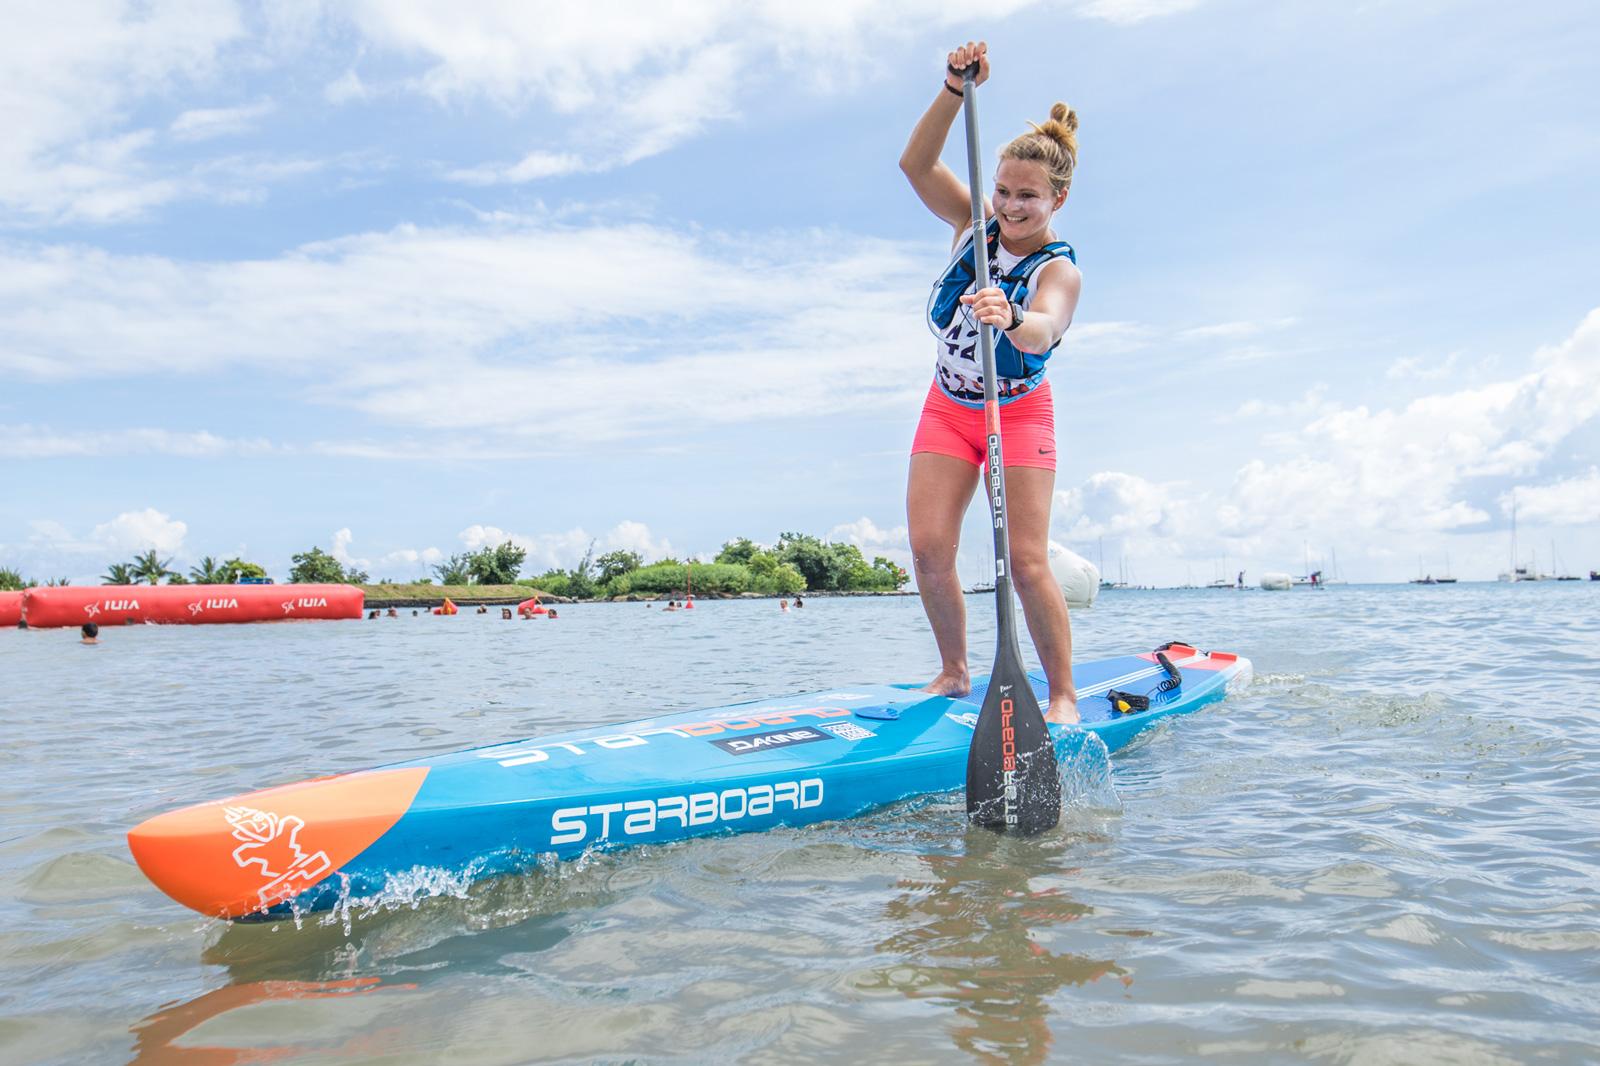 Air-France-Paddle-Festival-2018-Tahiti-Fiona-Wylde-USA-1-photo-credit-Georgia-Schoefield